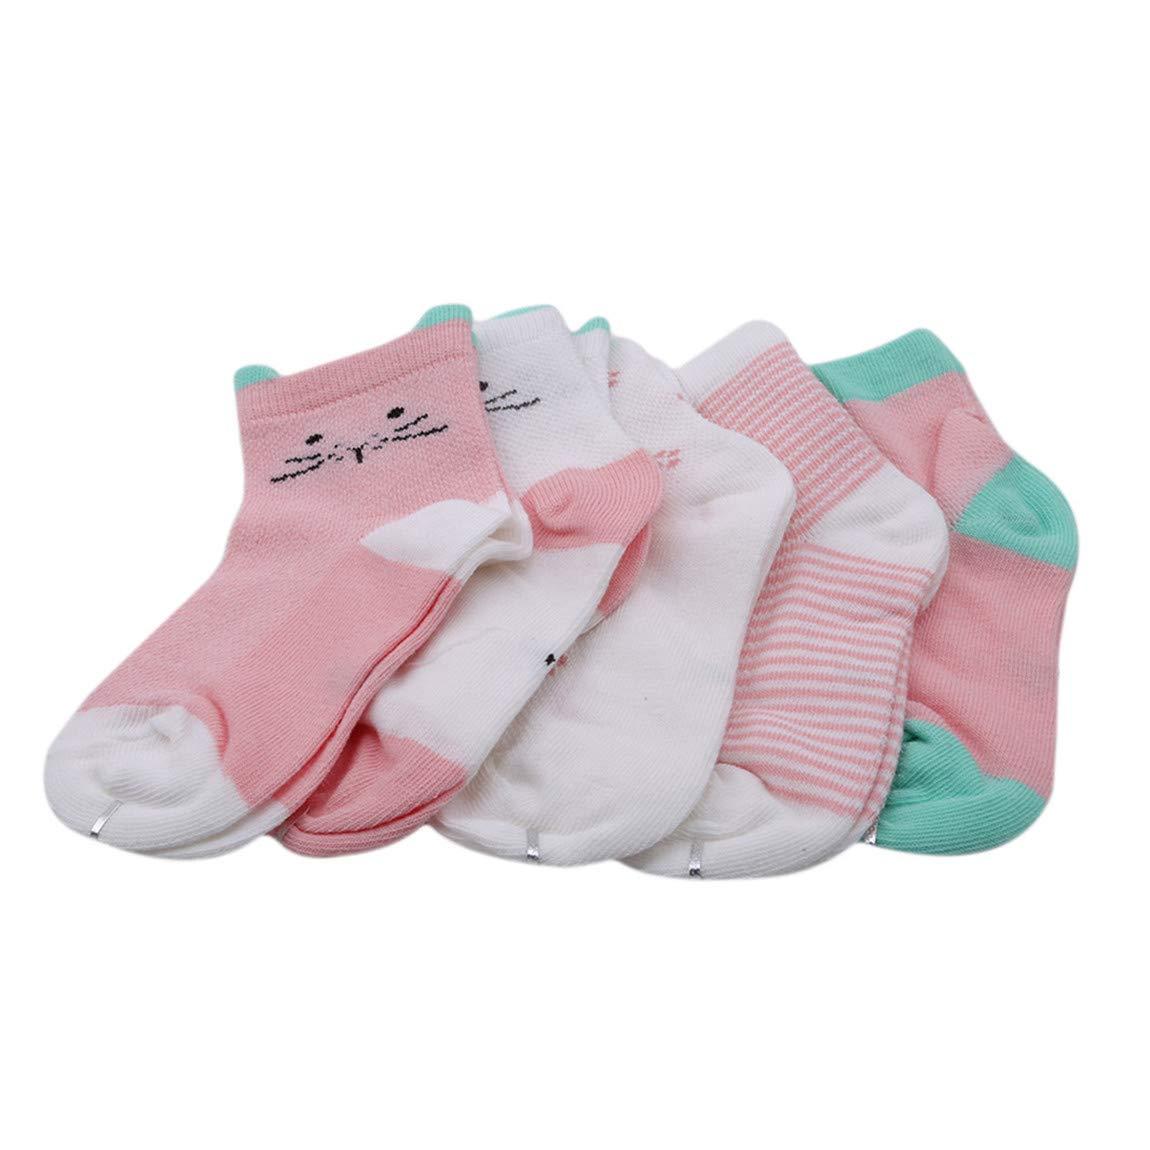 CH Baby Summer Warm Cotton Mesh Thin Socks Cute Cartoon Sweet Animal ShapedSoft Breathable Socks Good For Gift 5pcs Orange Pink Cat L